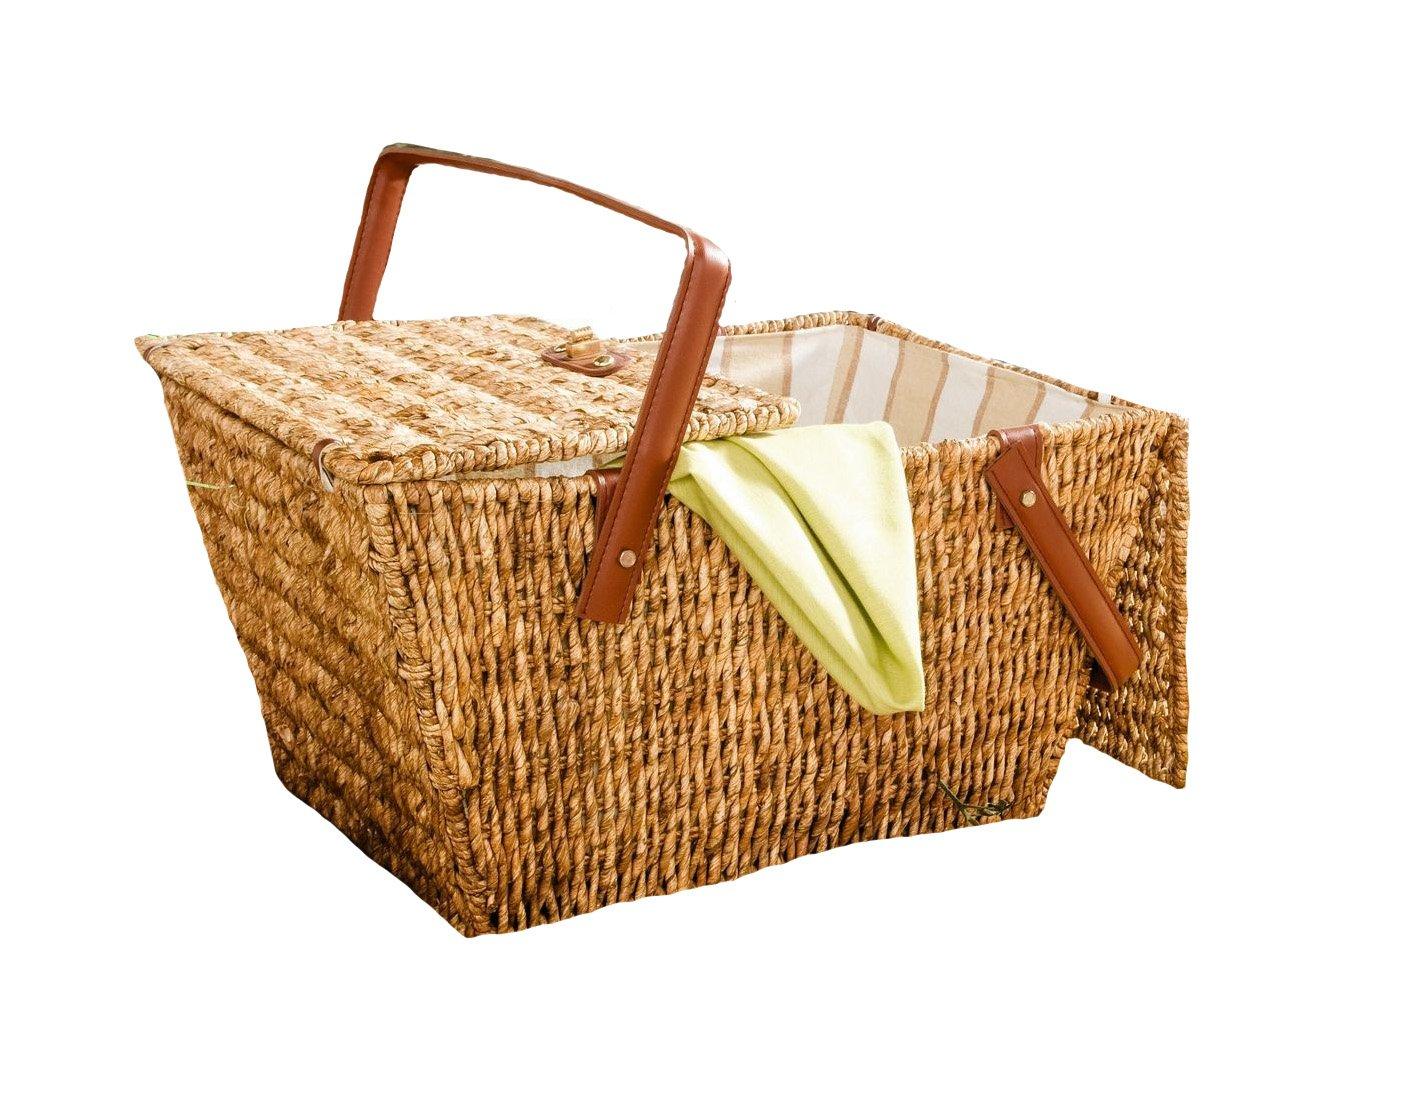 *Picknickkorb aus Maisstroh*